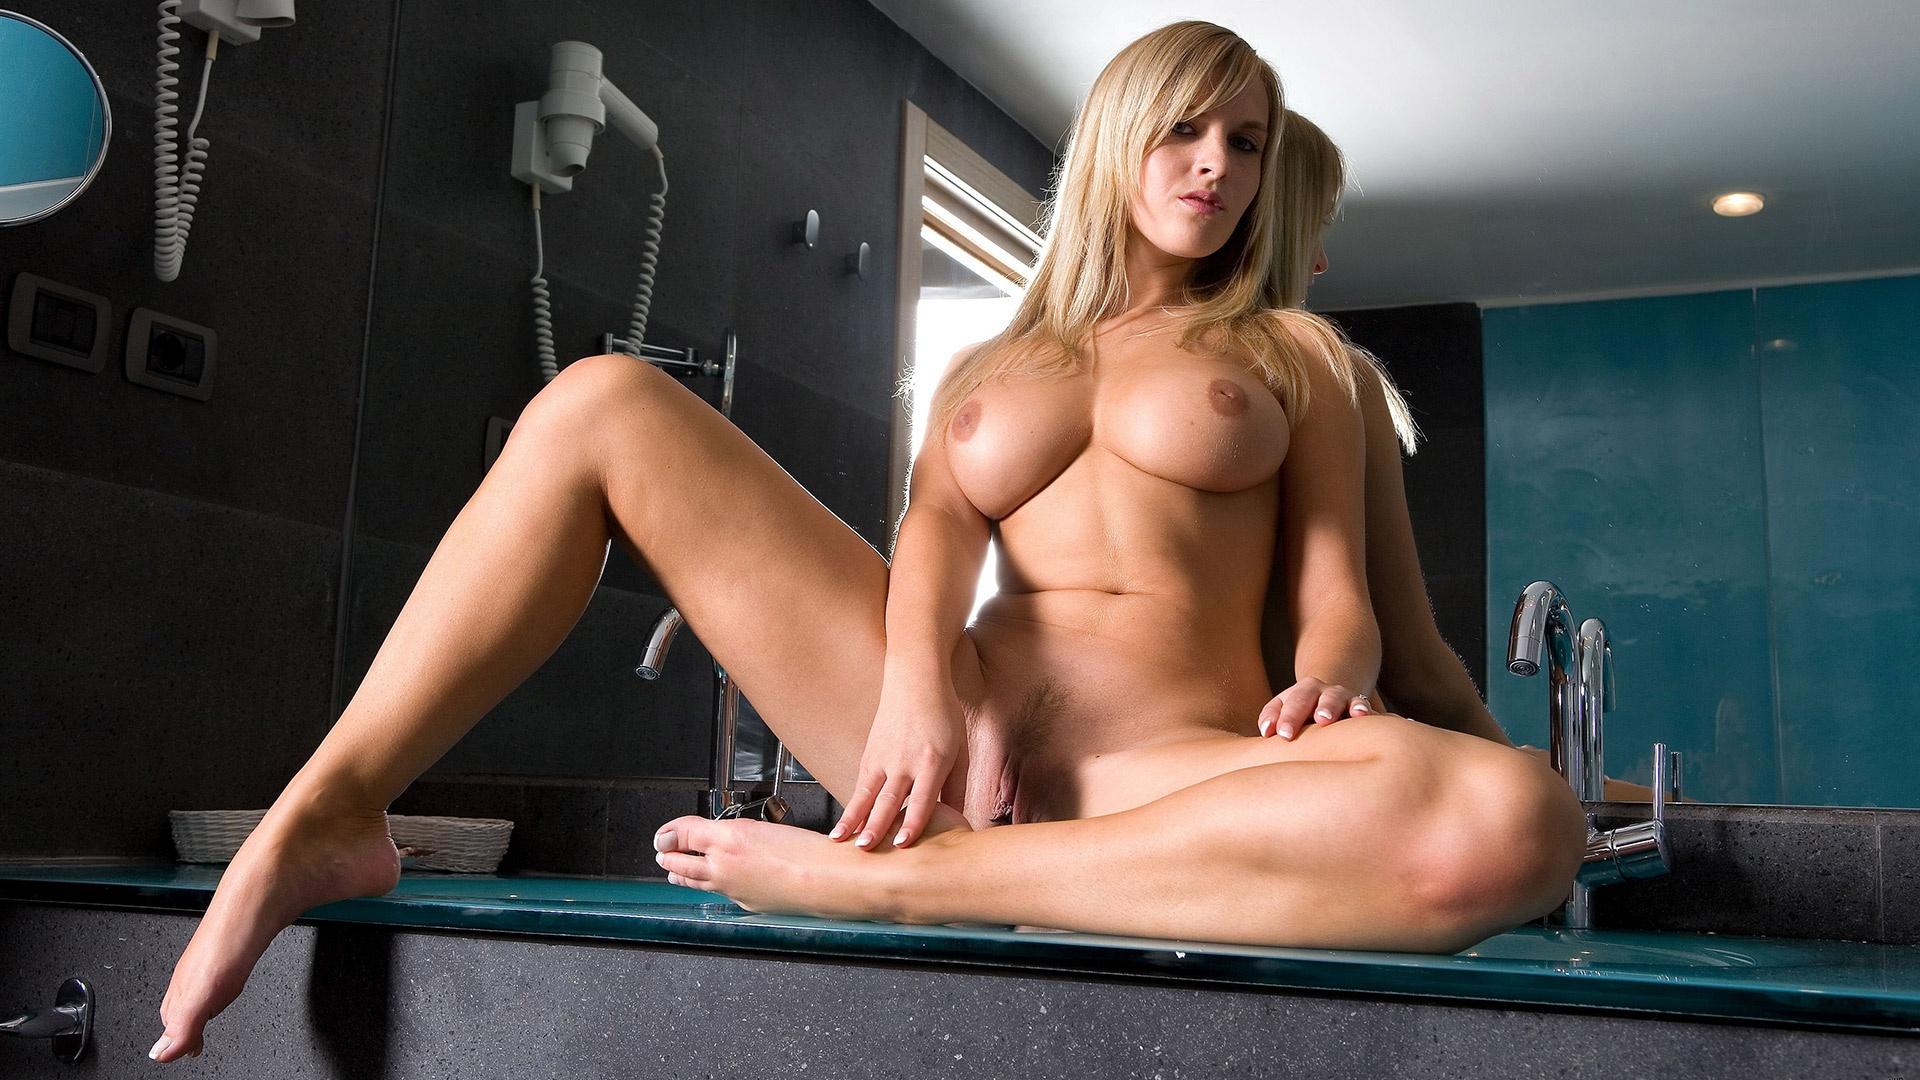 Naked big boobs wallpaper xxx photo